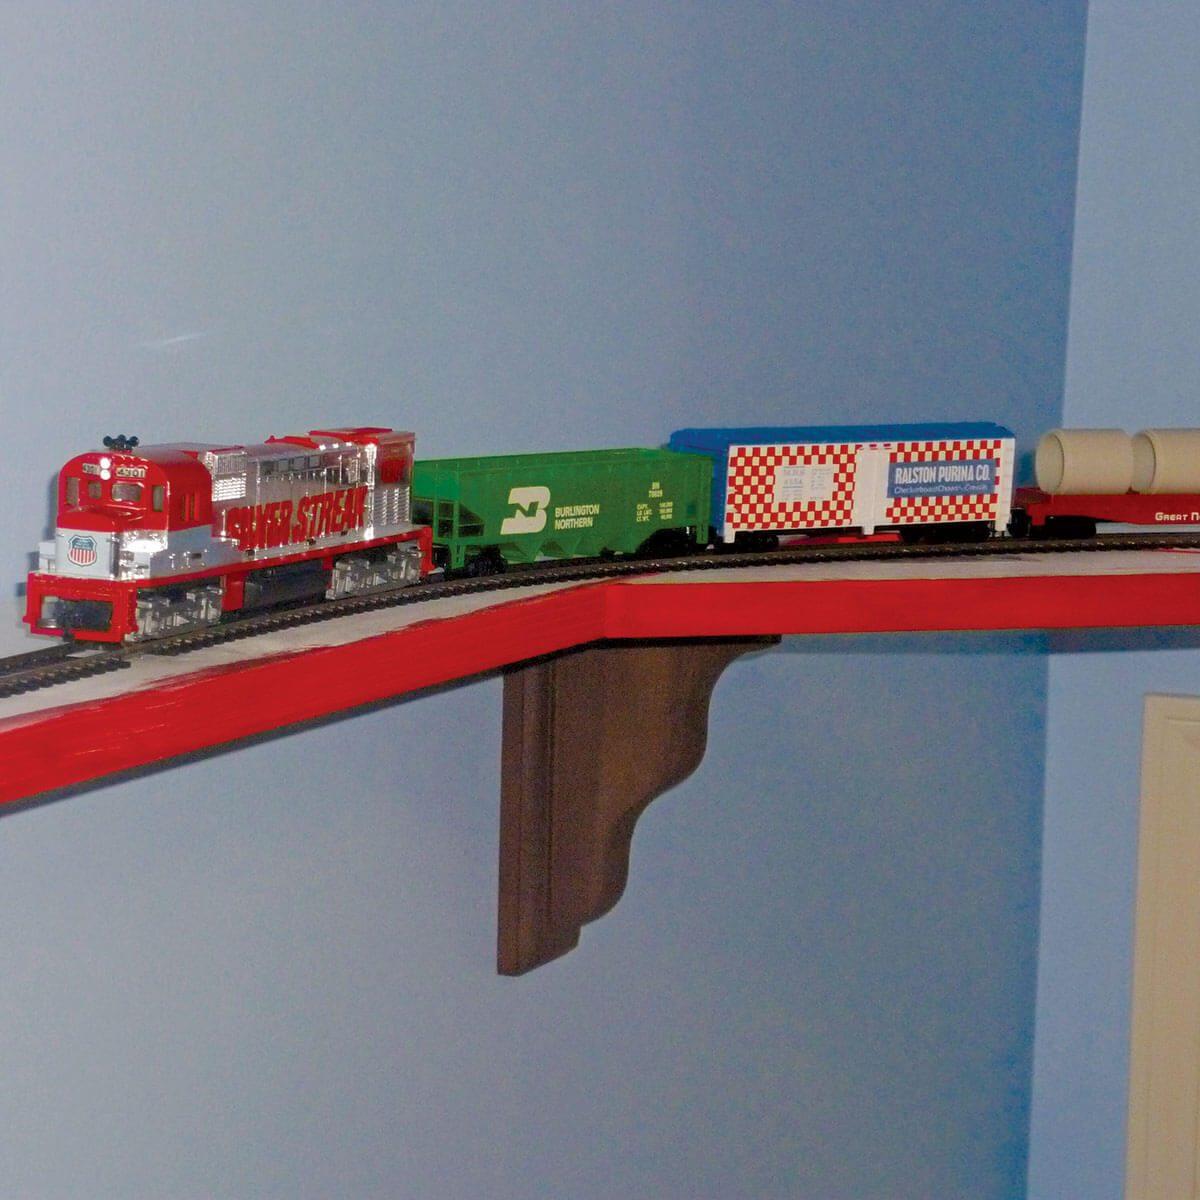 Bedroom train track